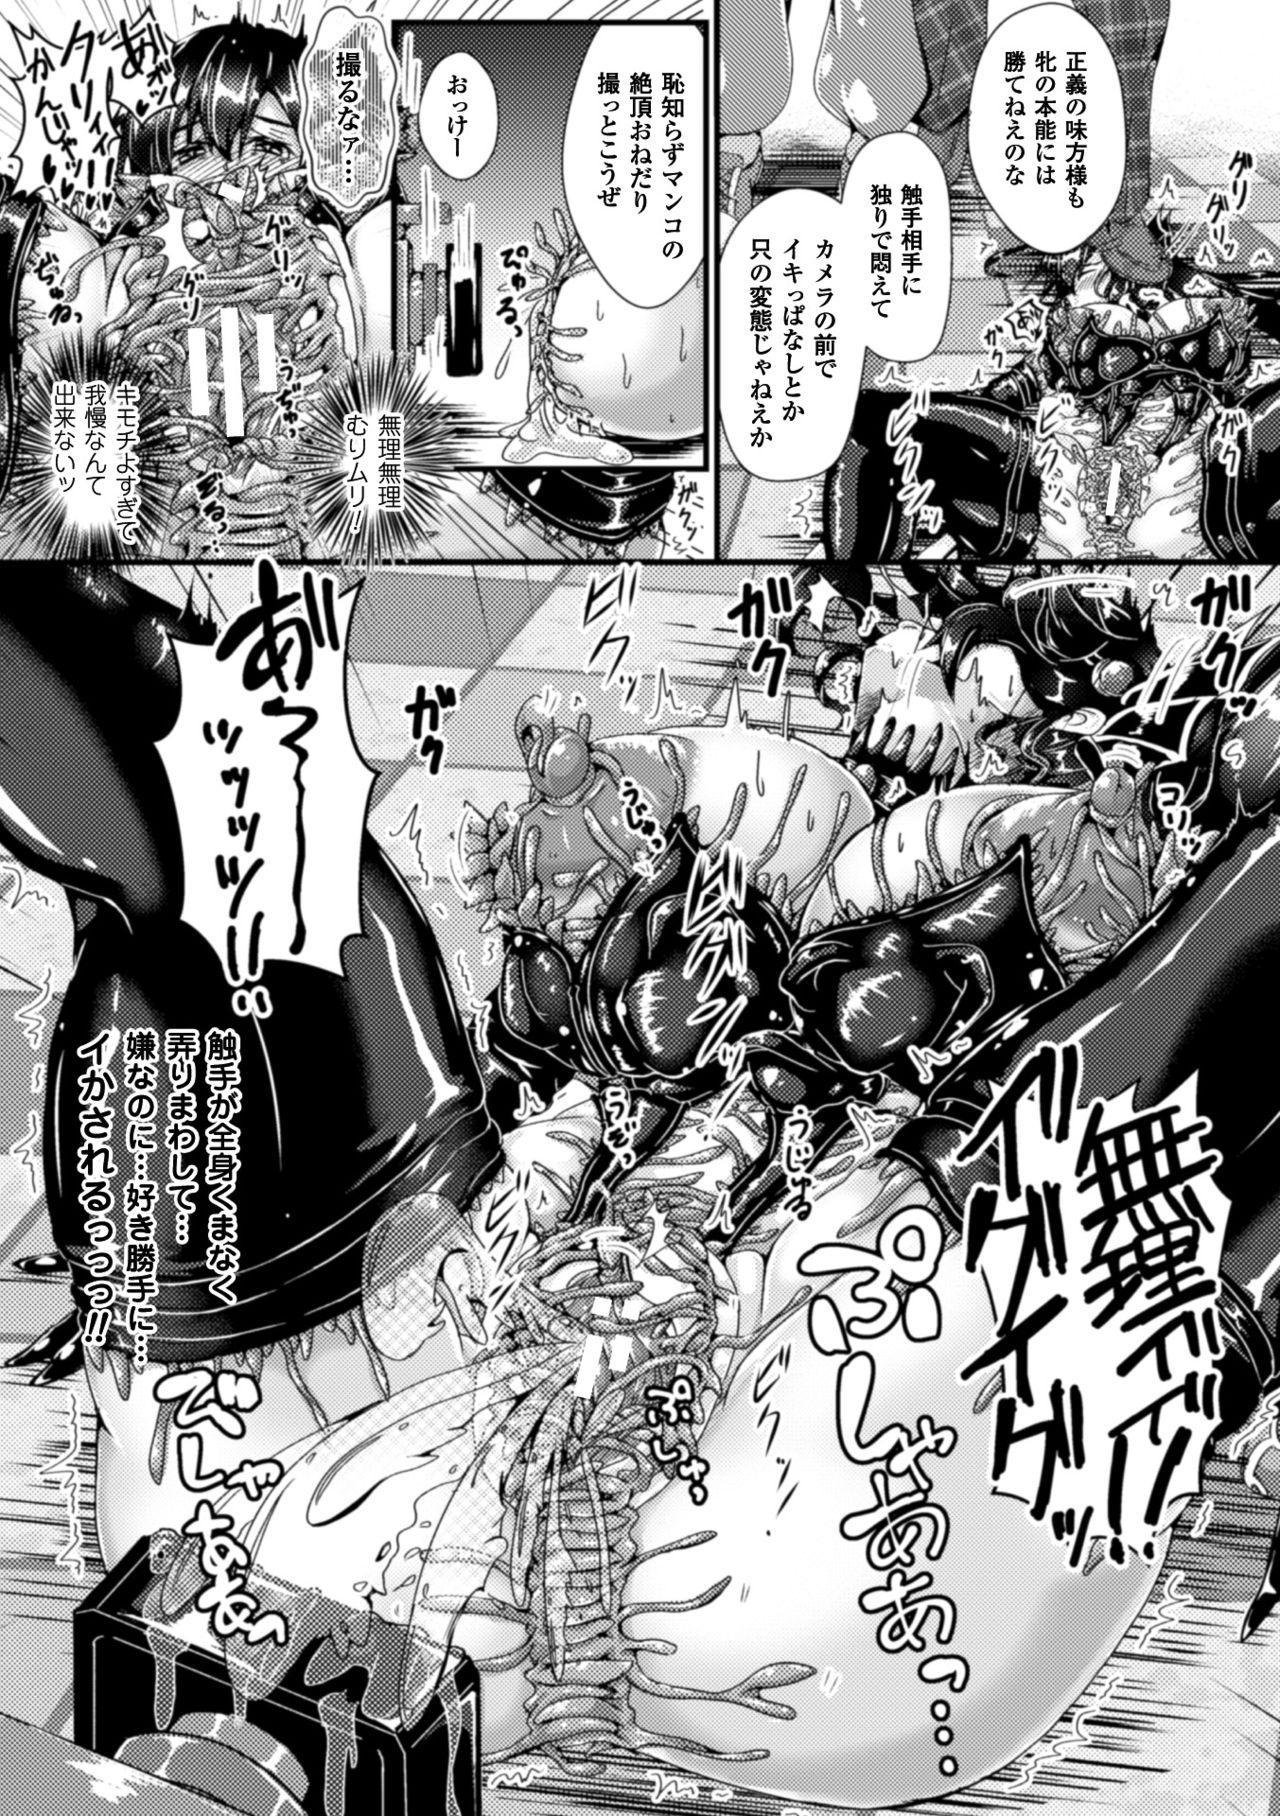 2D Comic Magazine Shokushu Yoroi ni Zenshin o Okasare Mugen Zecchou! Vol. 5 52